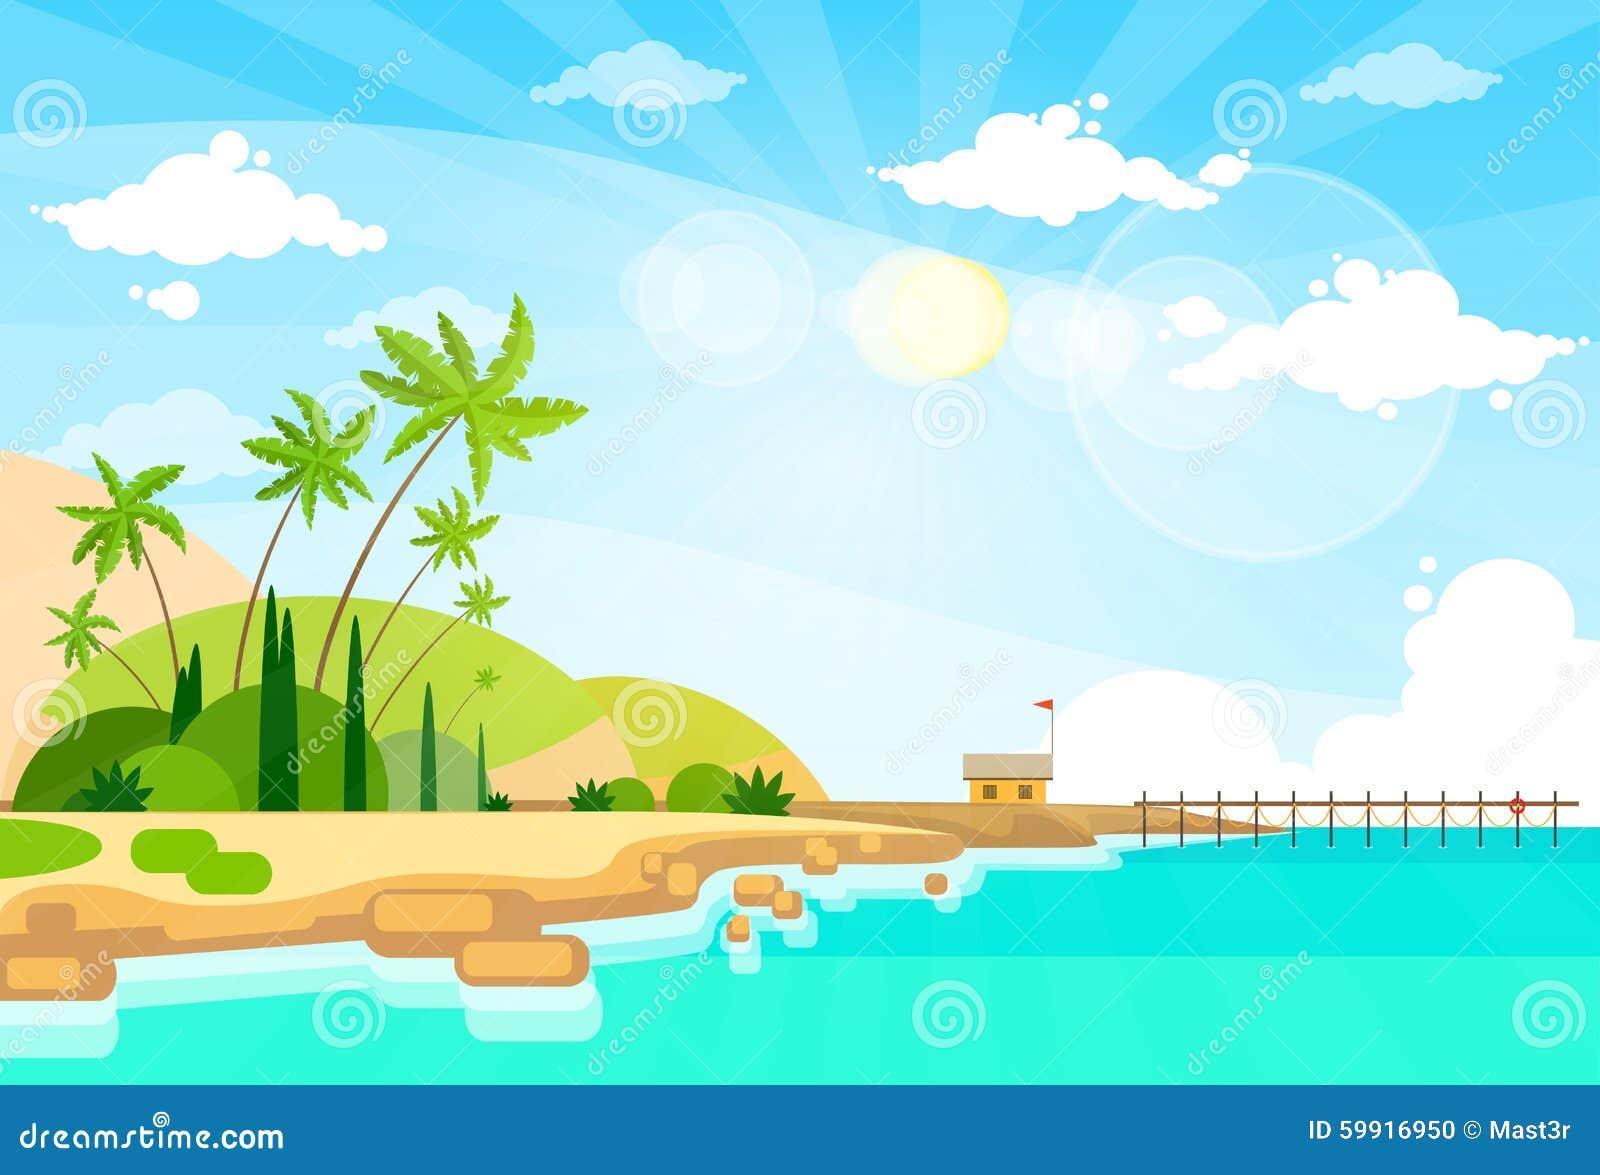 sea bed beach vector - photo #19